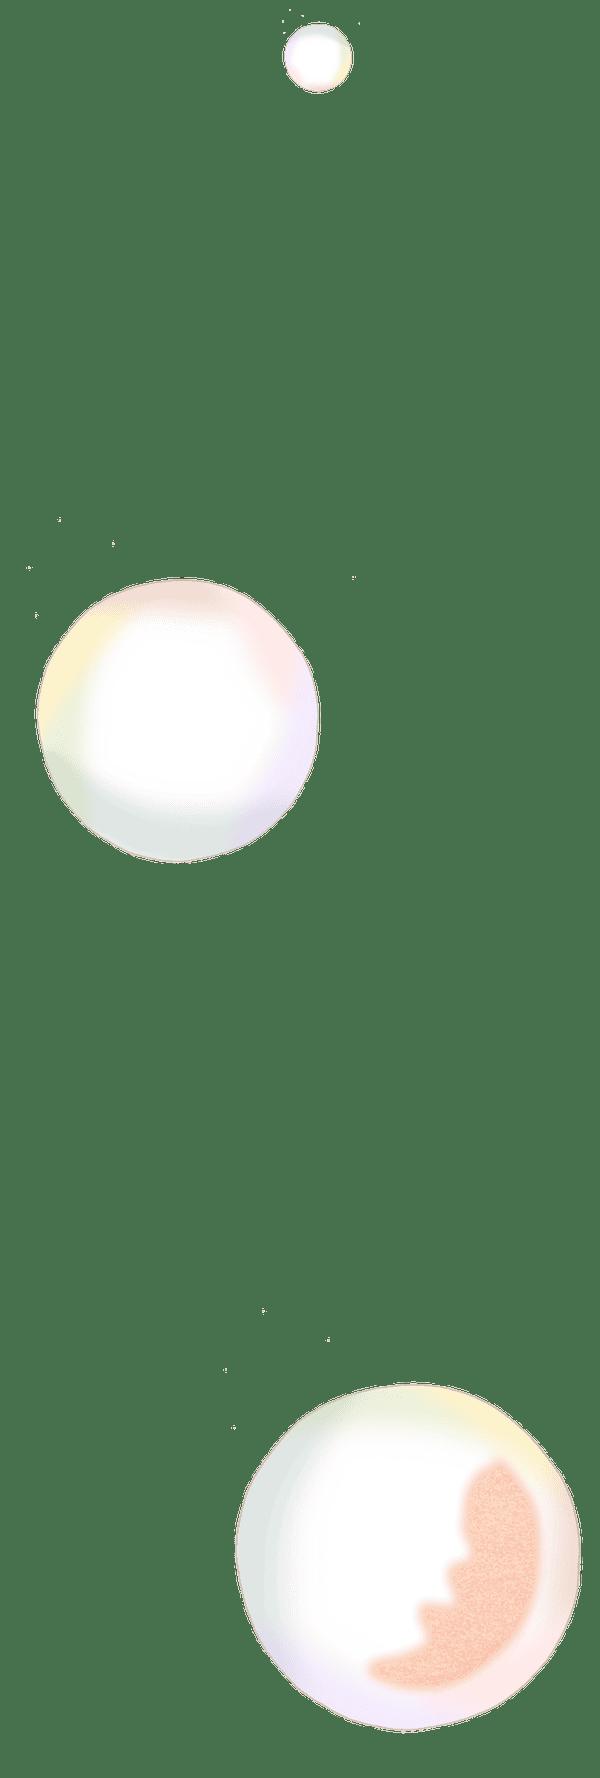 bubbles spot illustration